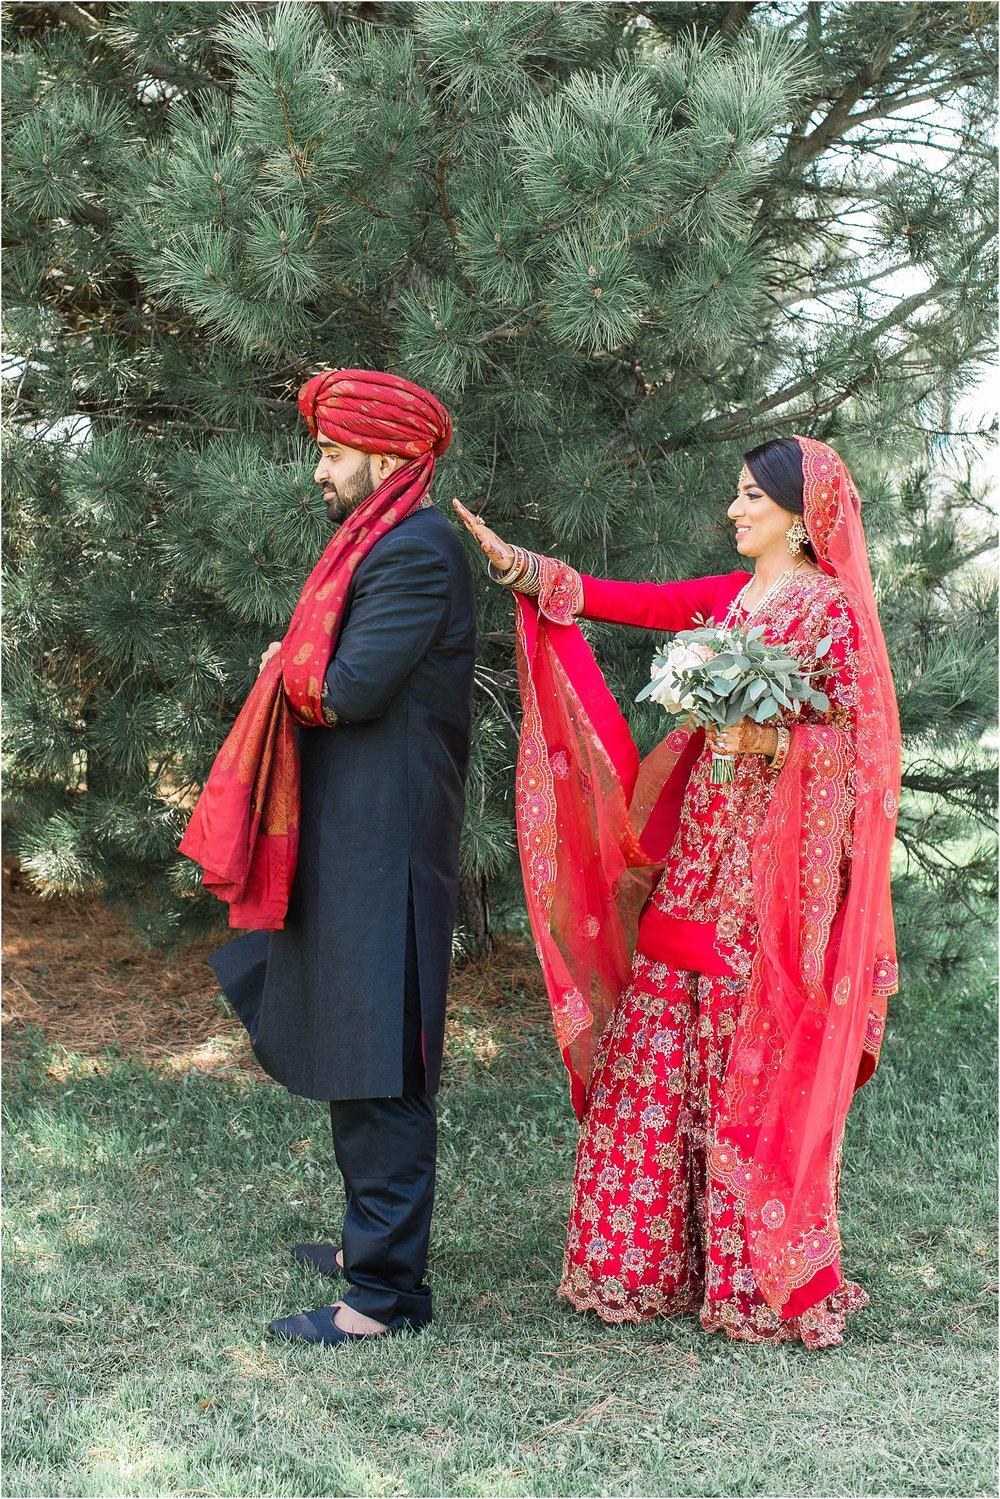 Jame-Masjid-Coopers-Mosque-Kariya-Park-Cherry-Blossoms-Wedding-Toronto-Mississauga-Brampton-Scarborough-GTA-Pakistani-Indian-Wedding-Engagement-Photographer-Photography_0011.jpg